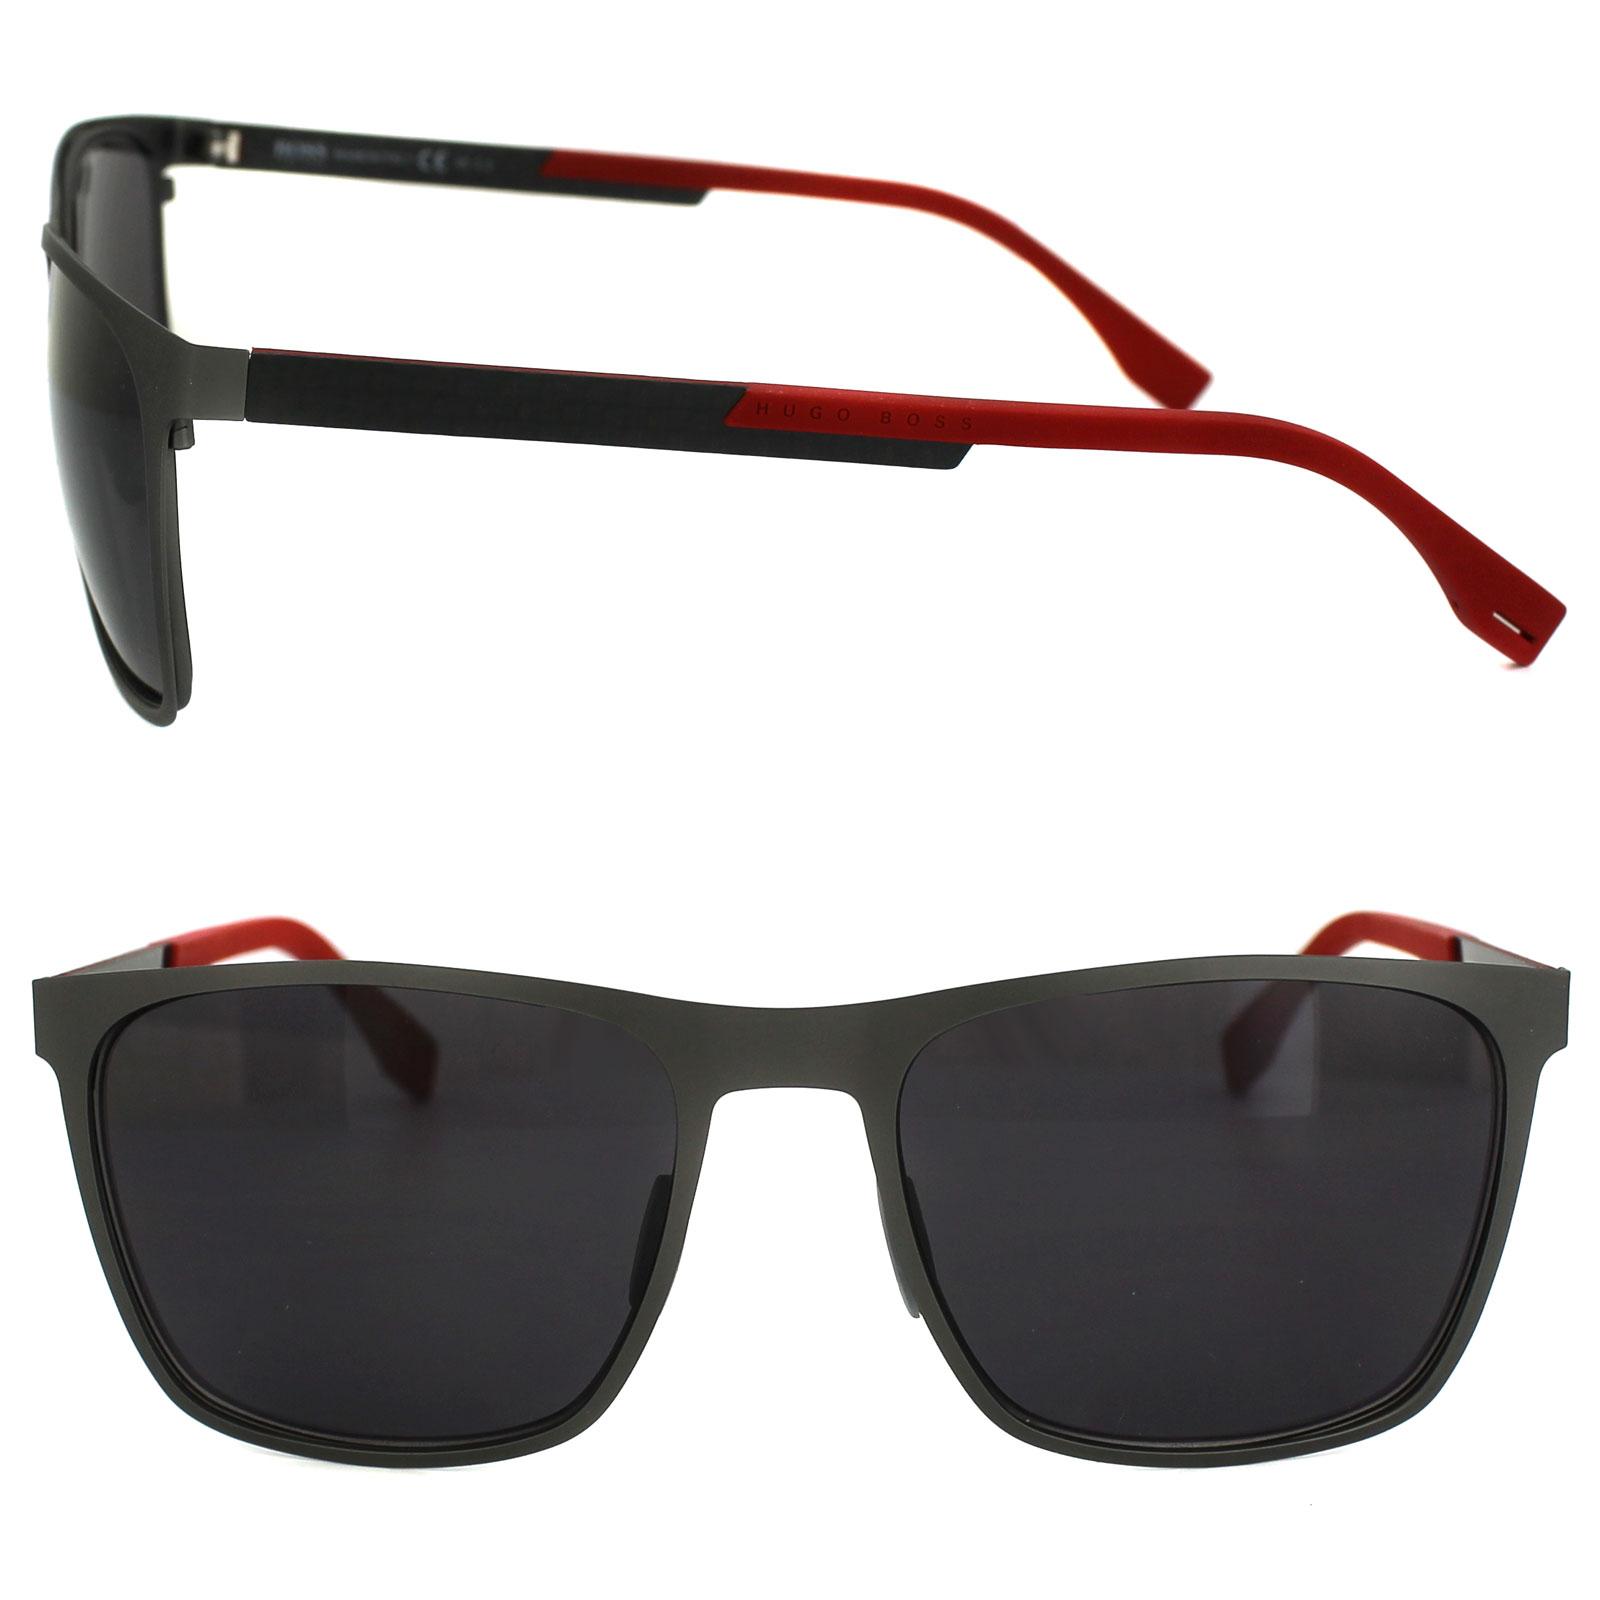 Cheap Hugo Boss 0732 Sunglasses Discounted Sunglasses